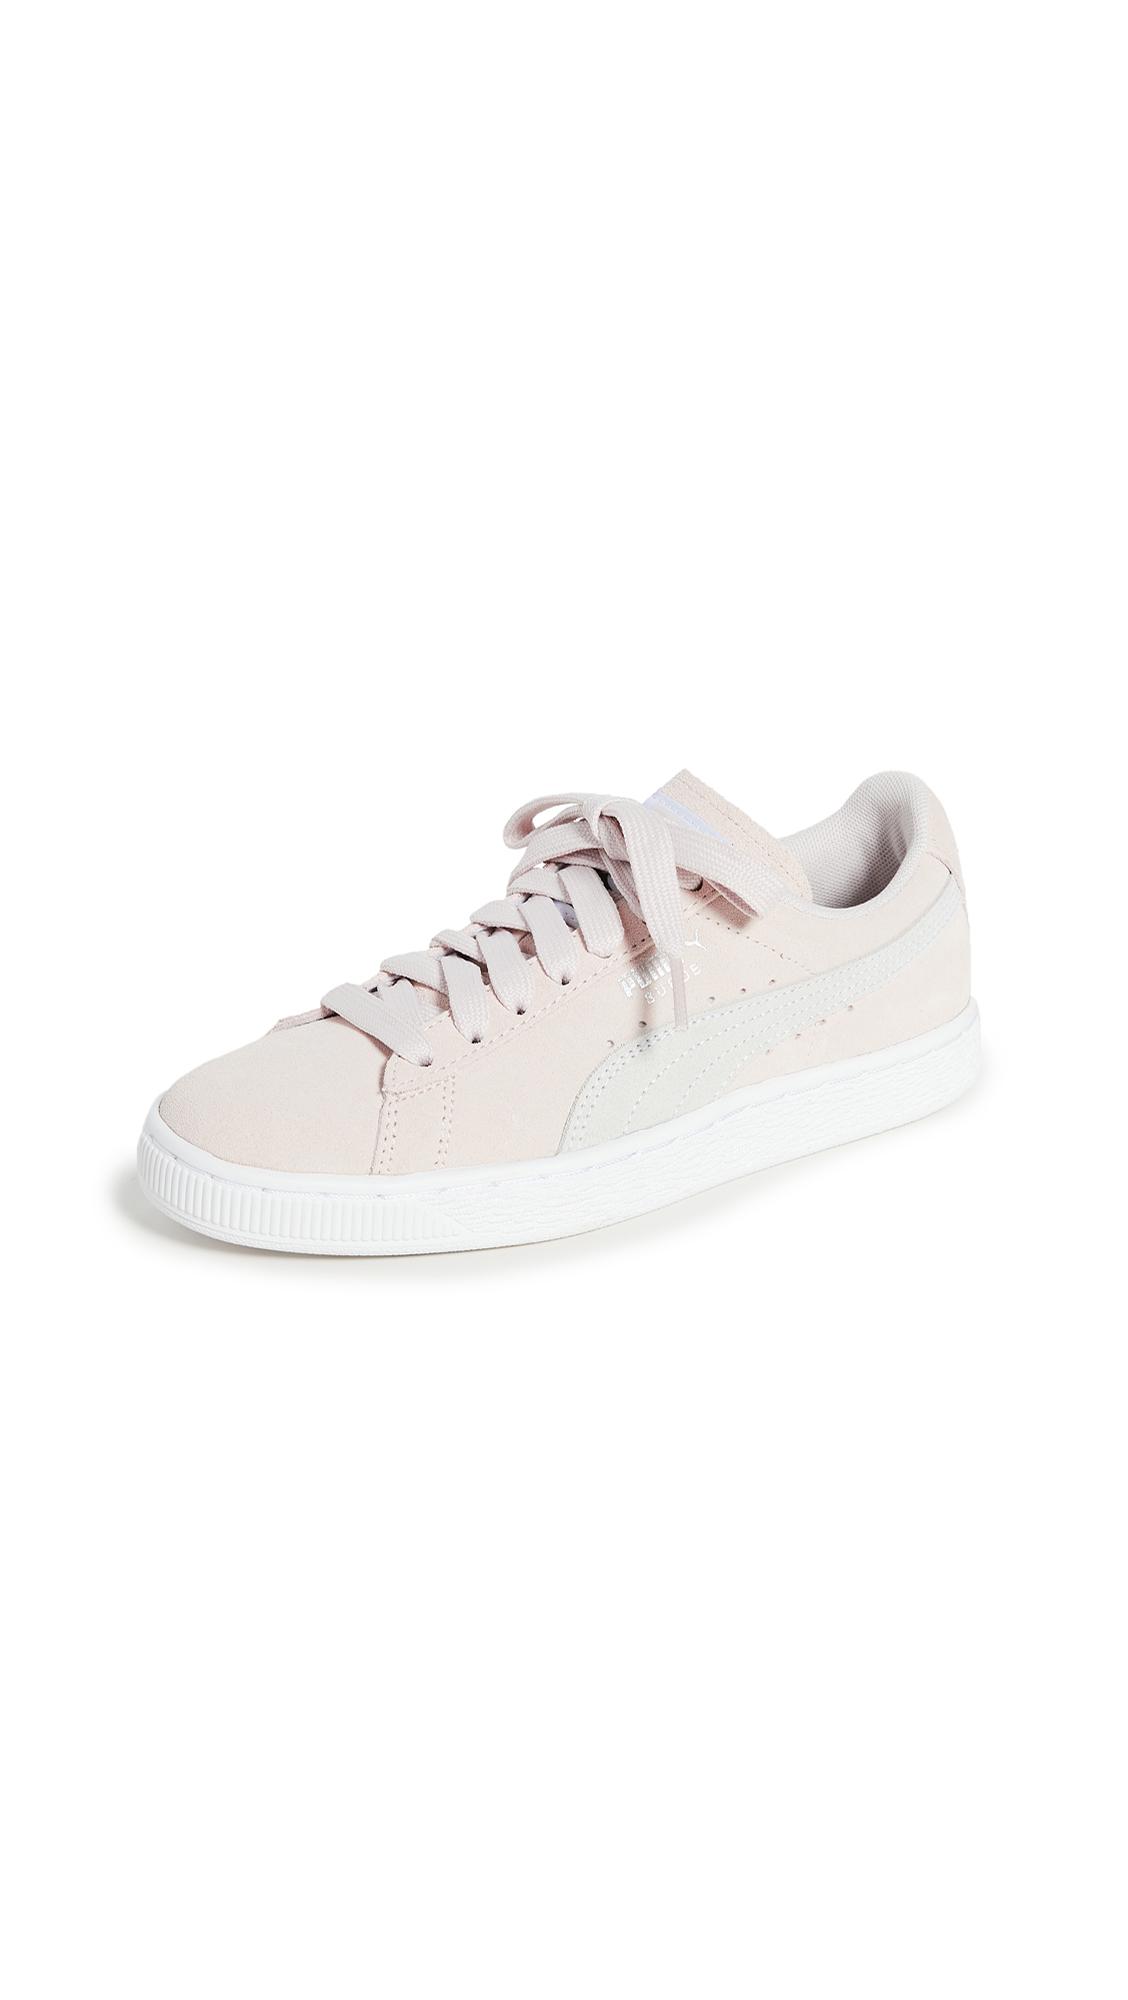 Buy PUMA Suede Classics Sneakers online, shop PUMA